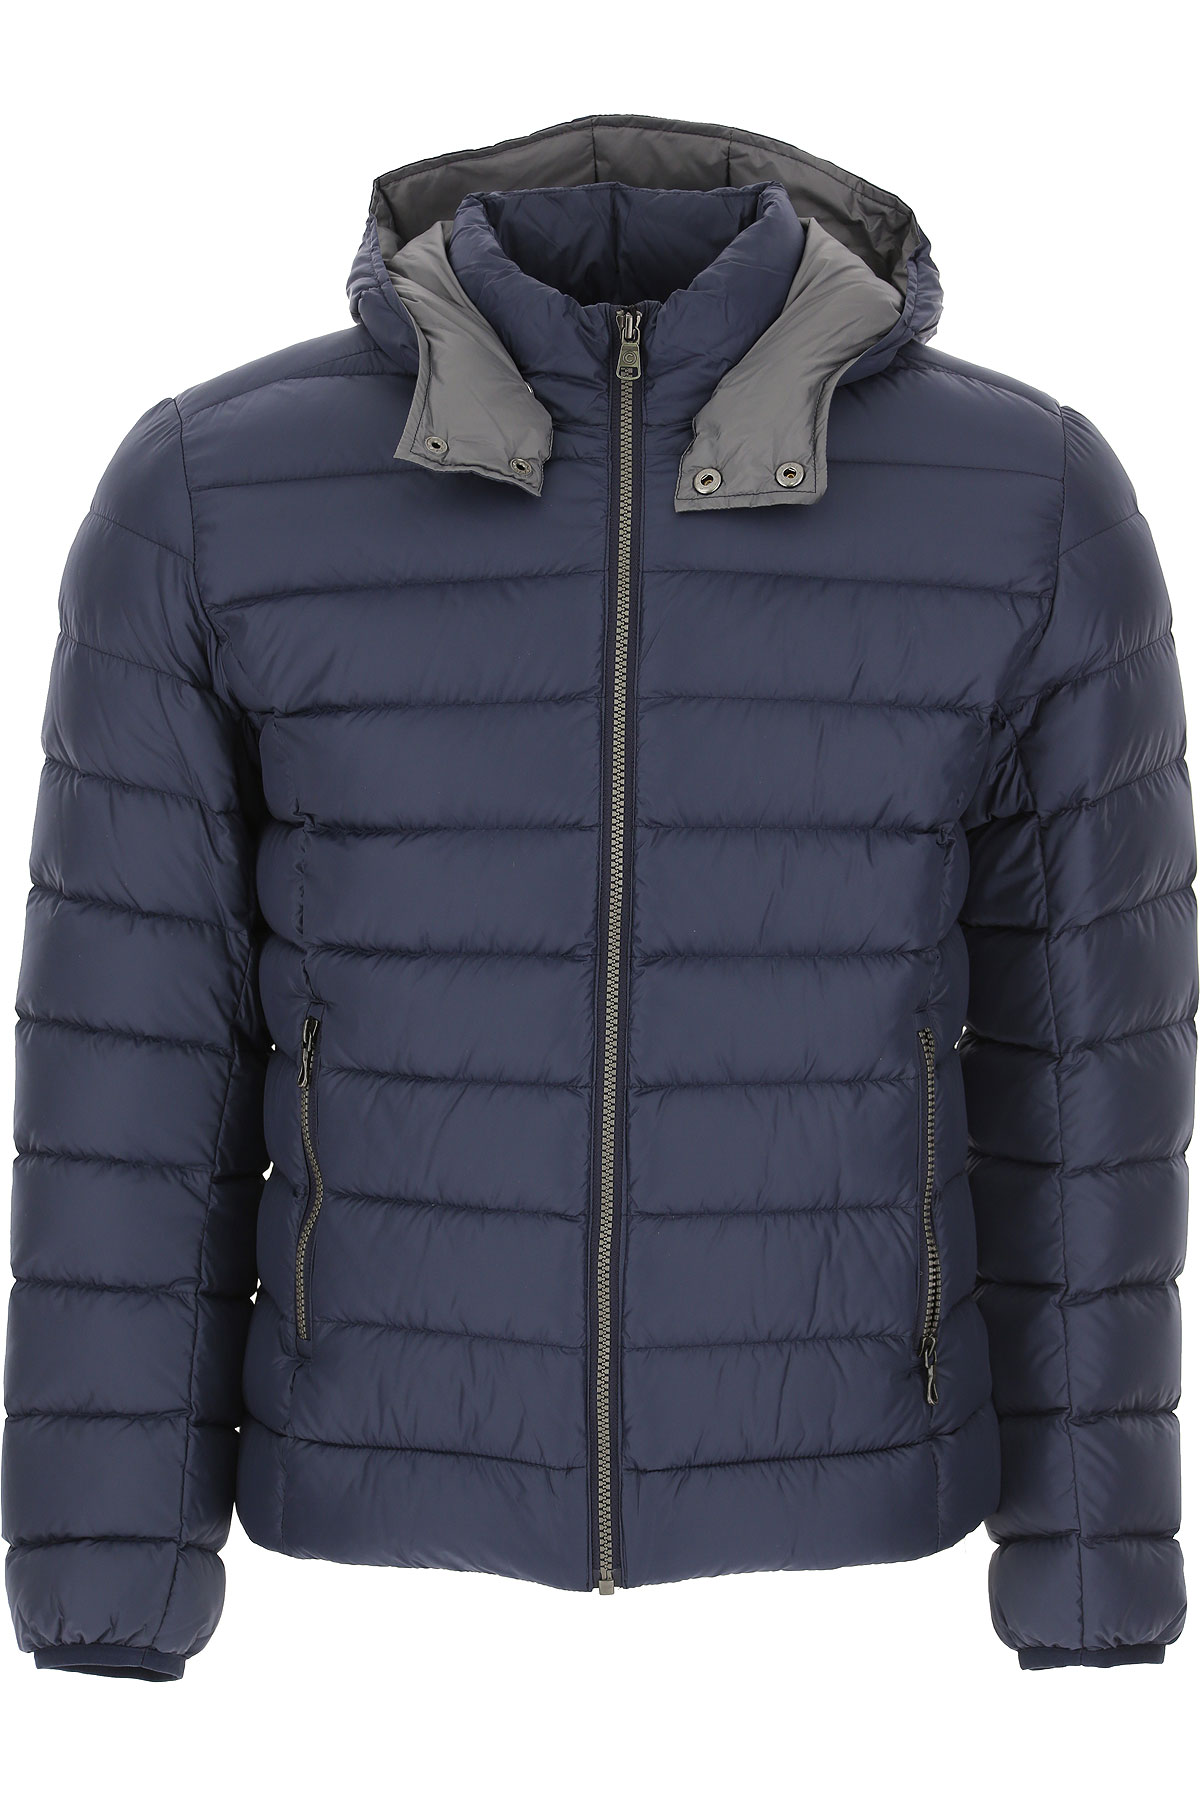 Colmar Down Jacket for Men, Puffer Ski Jacket On Sale, navy, polyamide, 2019, L M S XL XS XXL XXXL